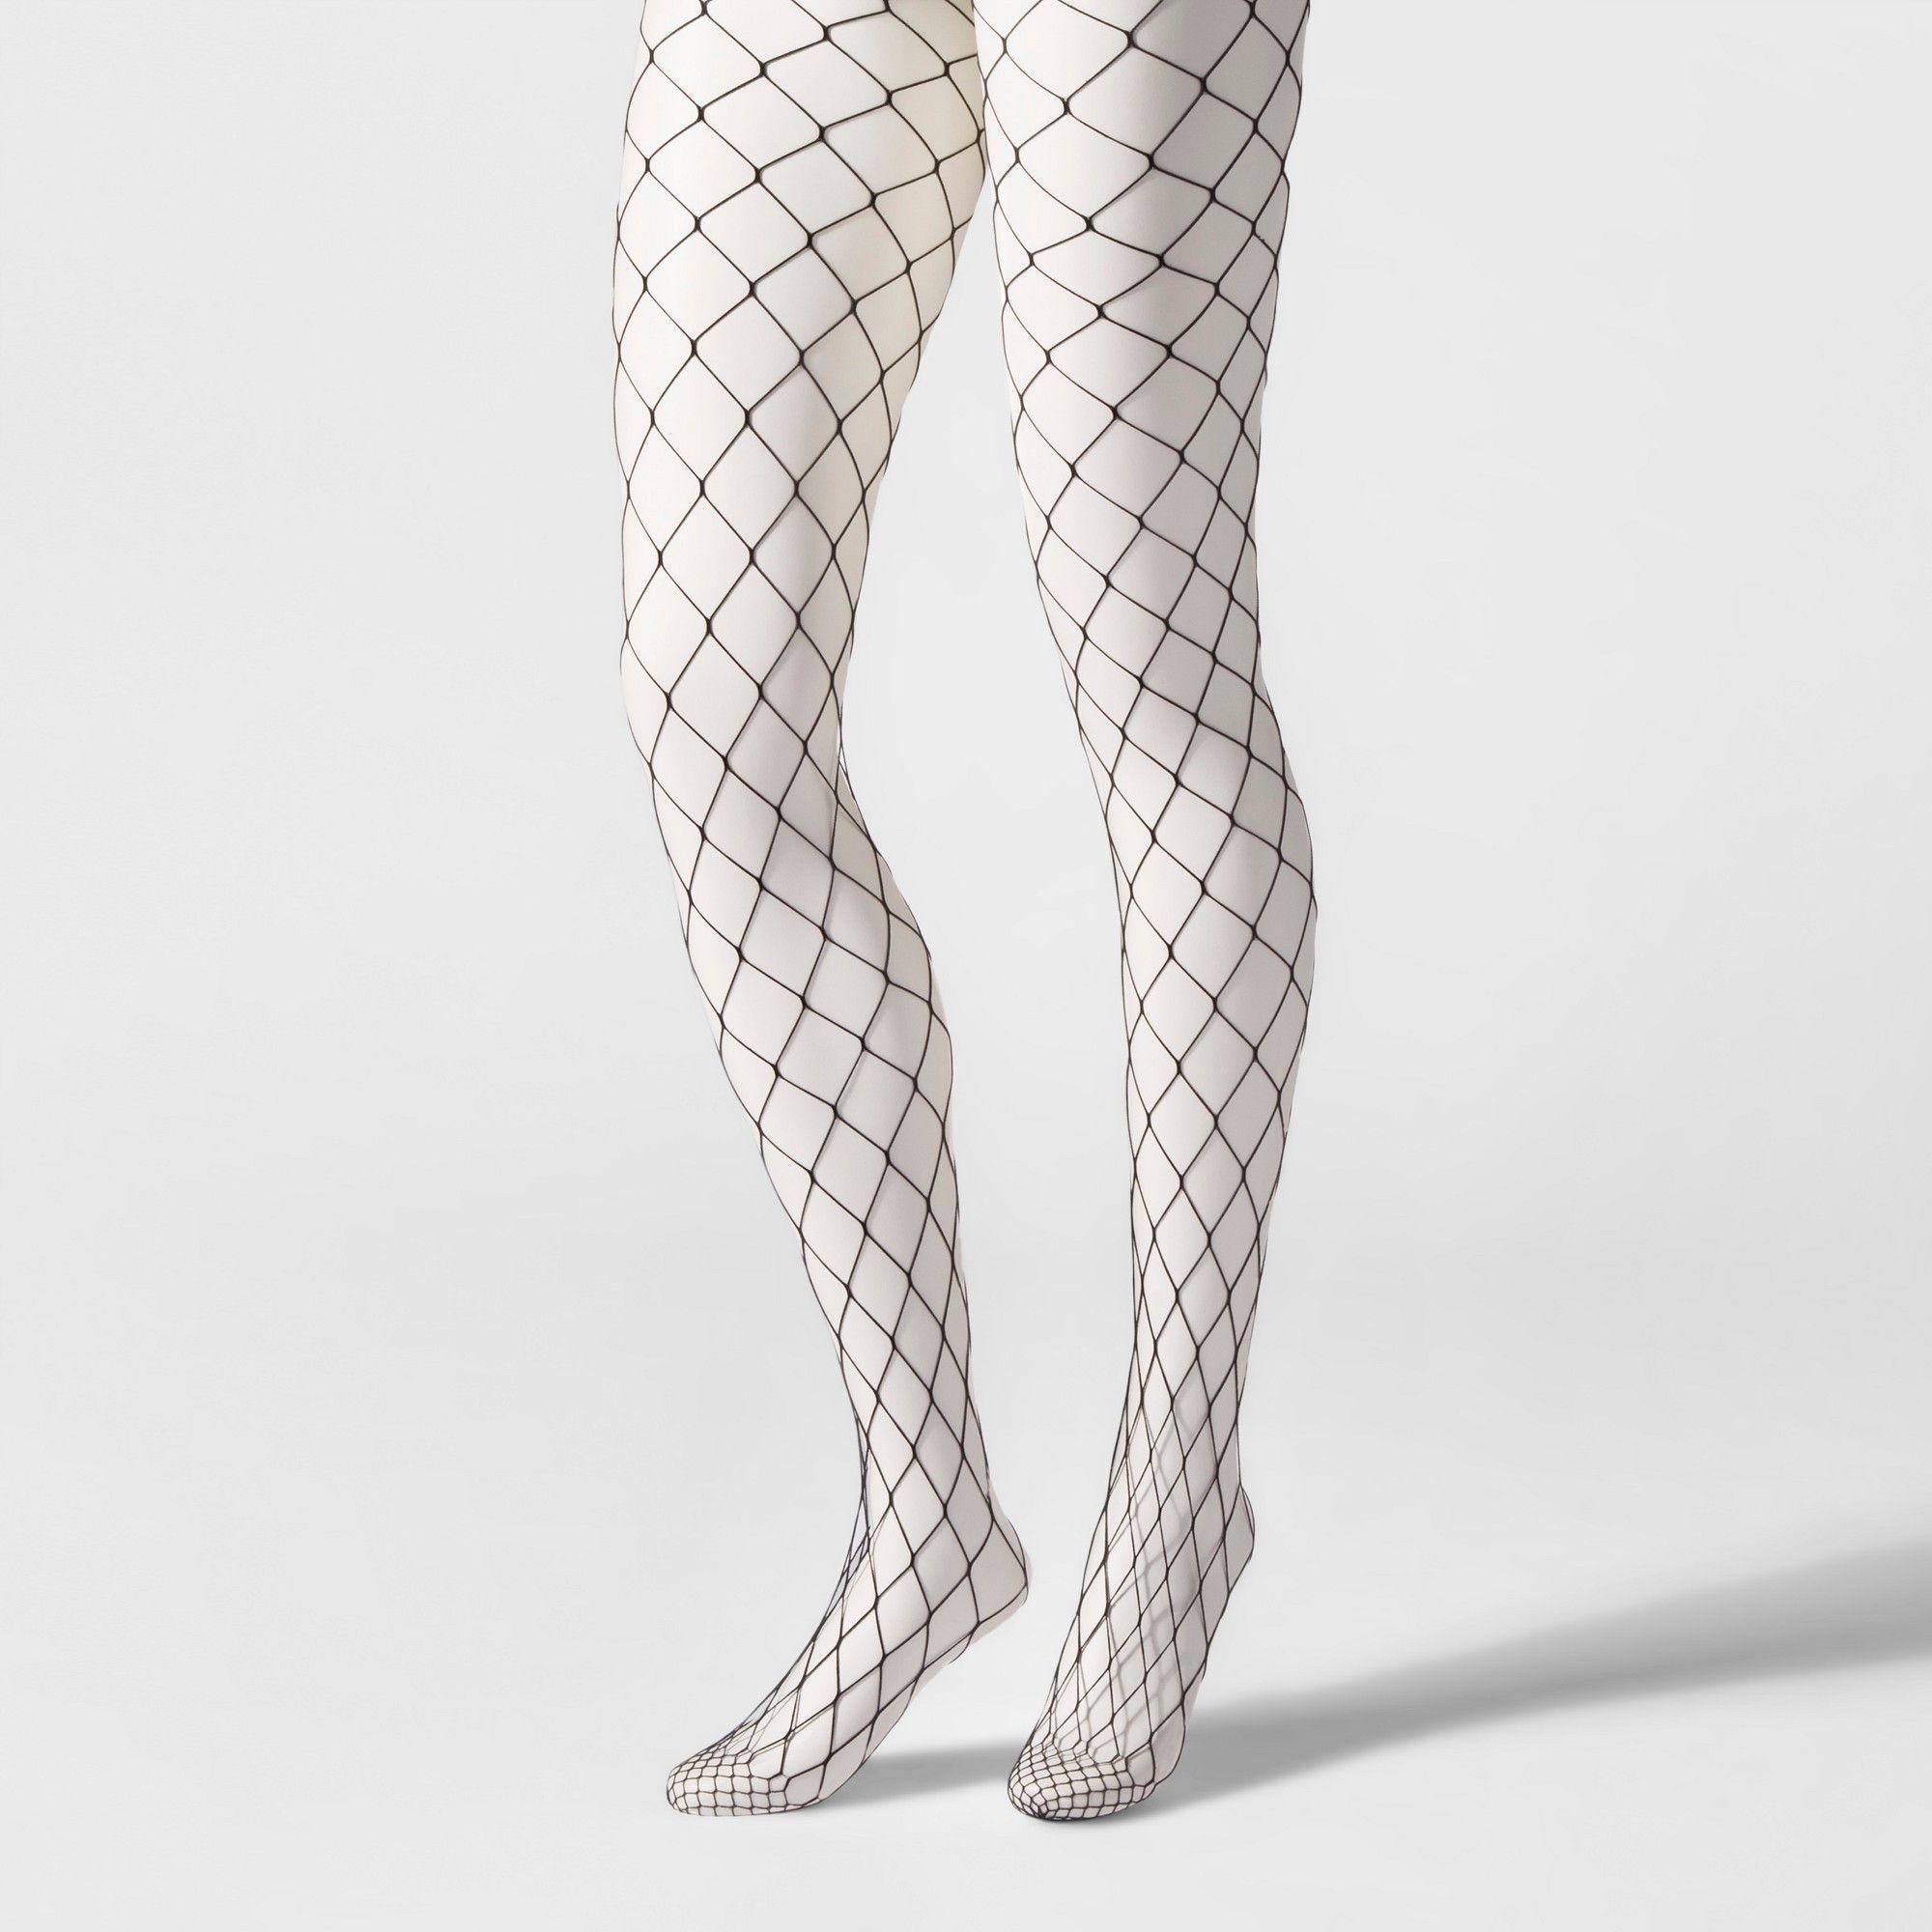 2e0ef844cb4ec4 Women's Size Tights - Xhilaration Black L/XL | Products | Black ...